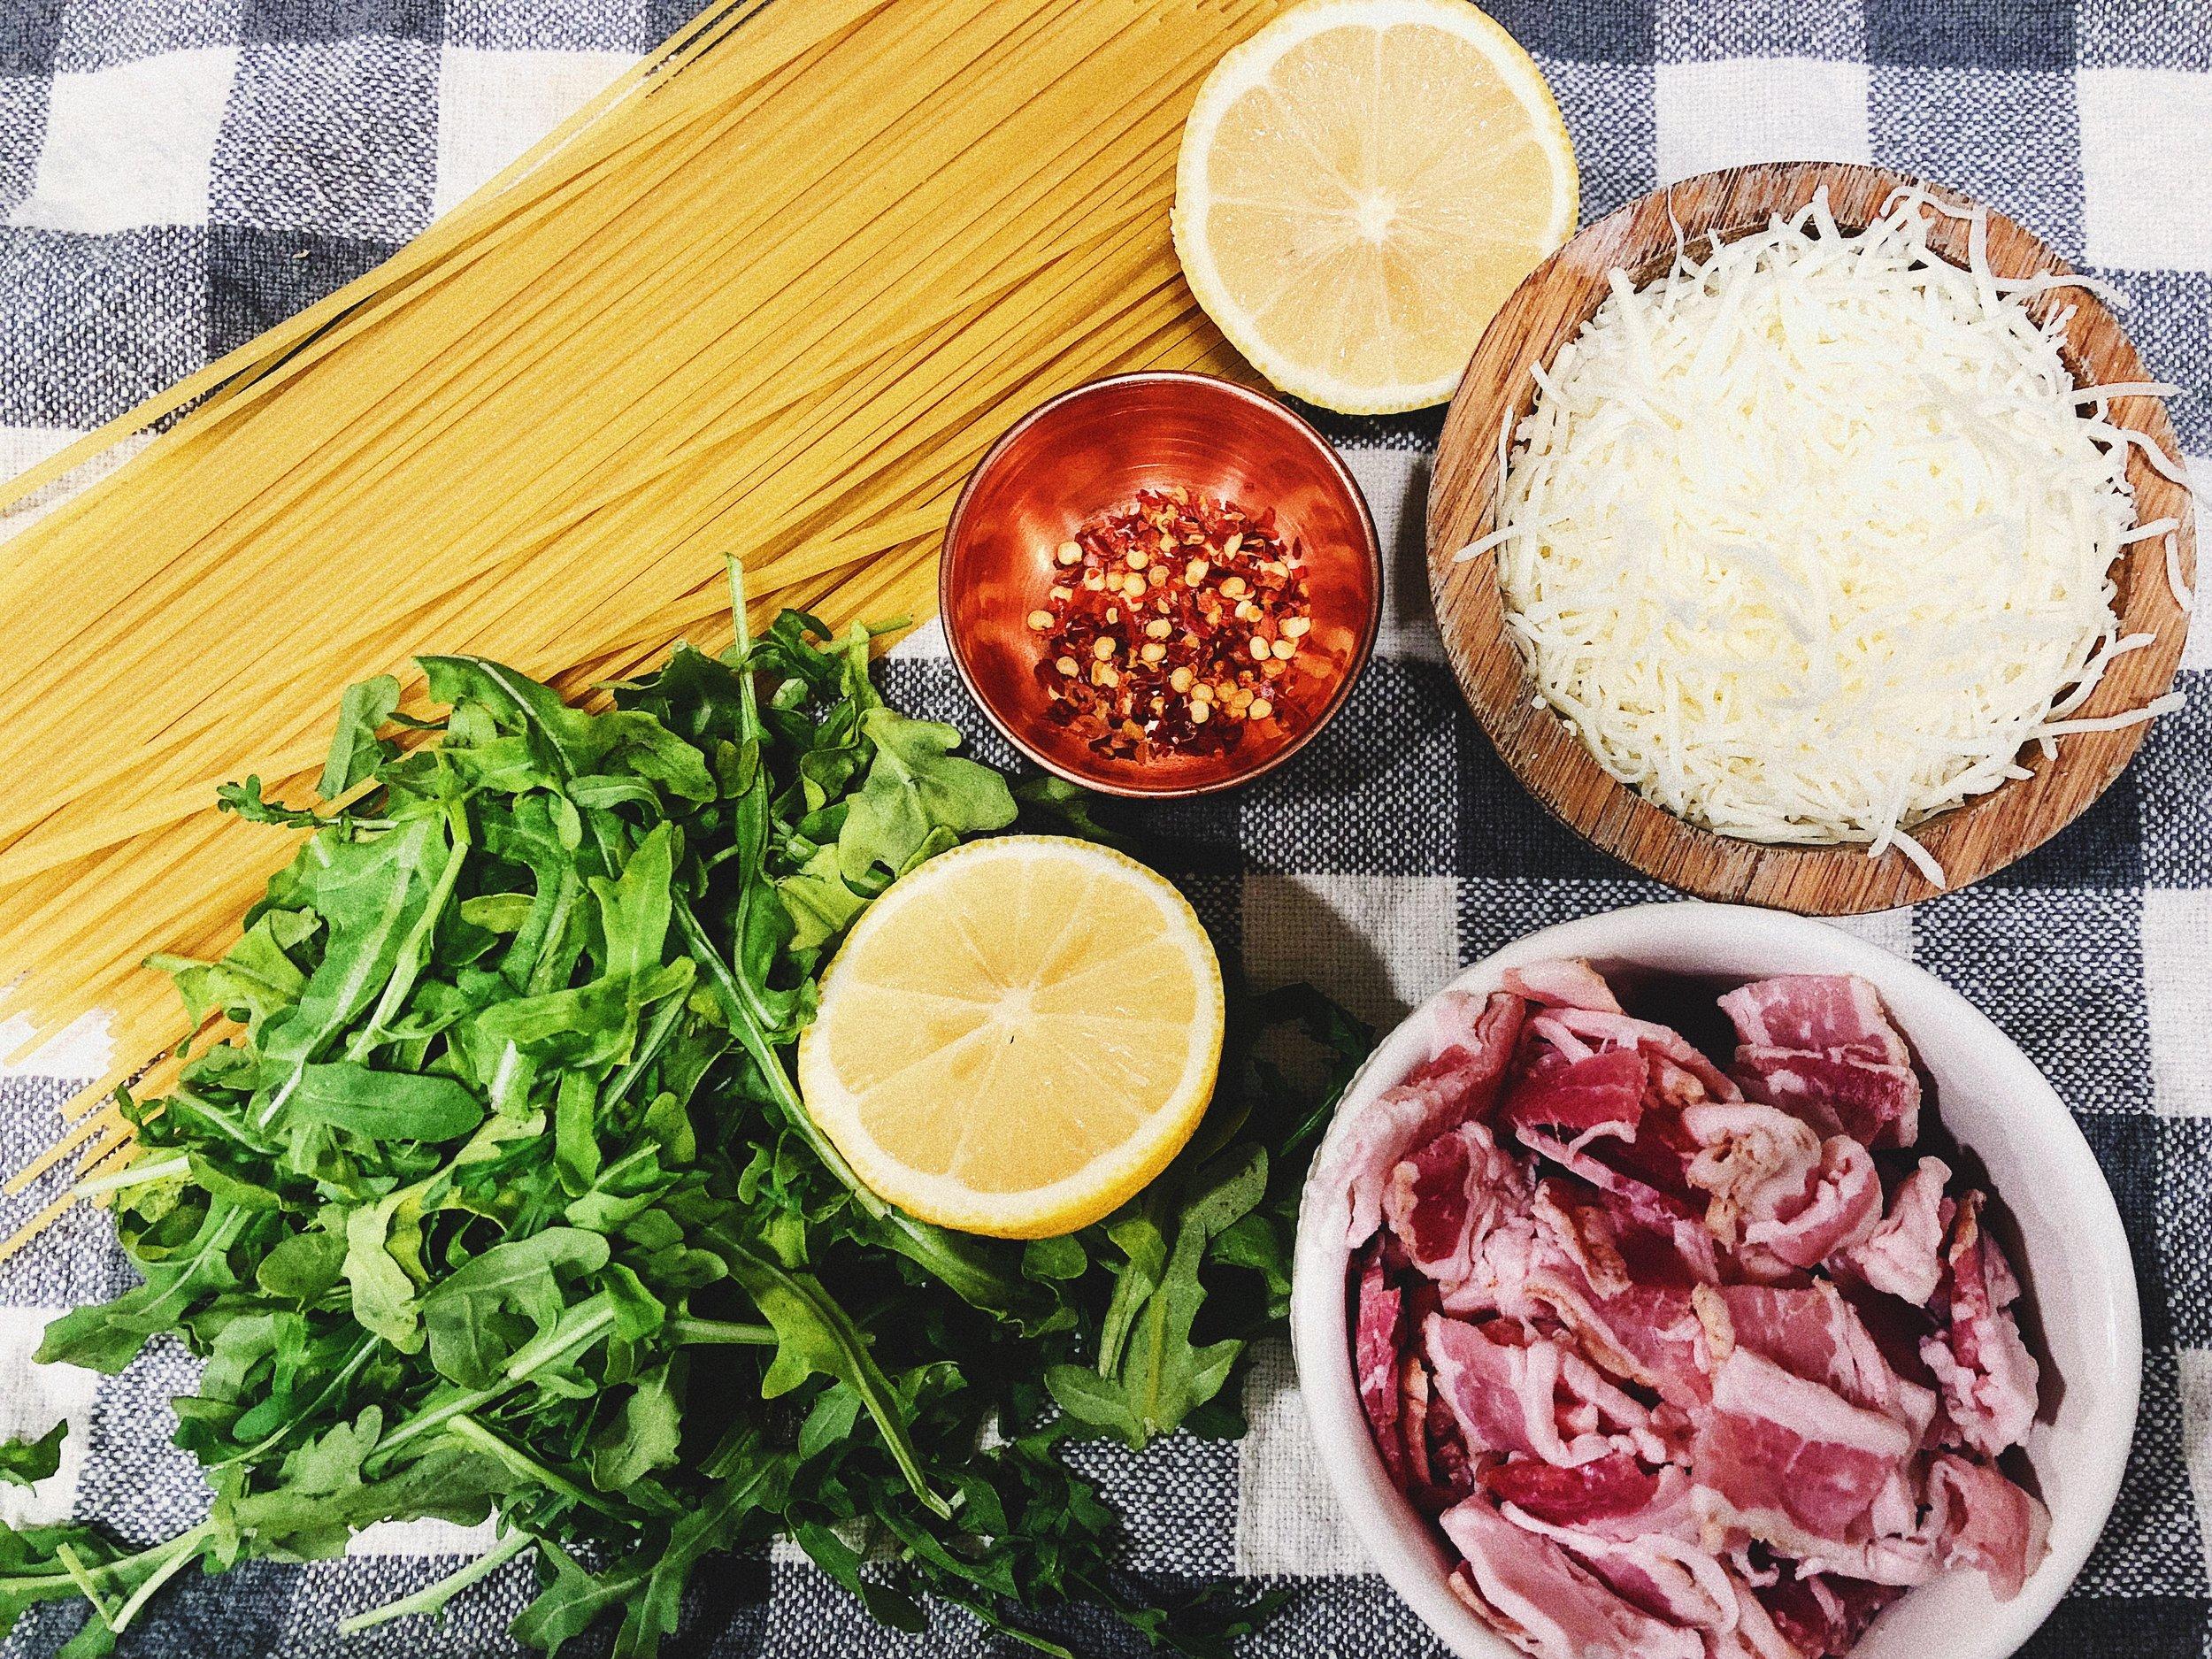 lemony arugula cacio e pepe ingredients